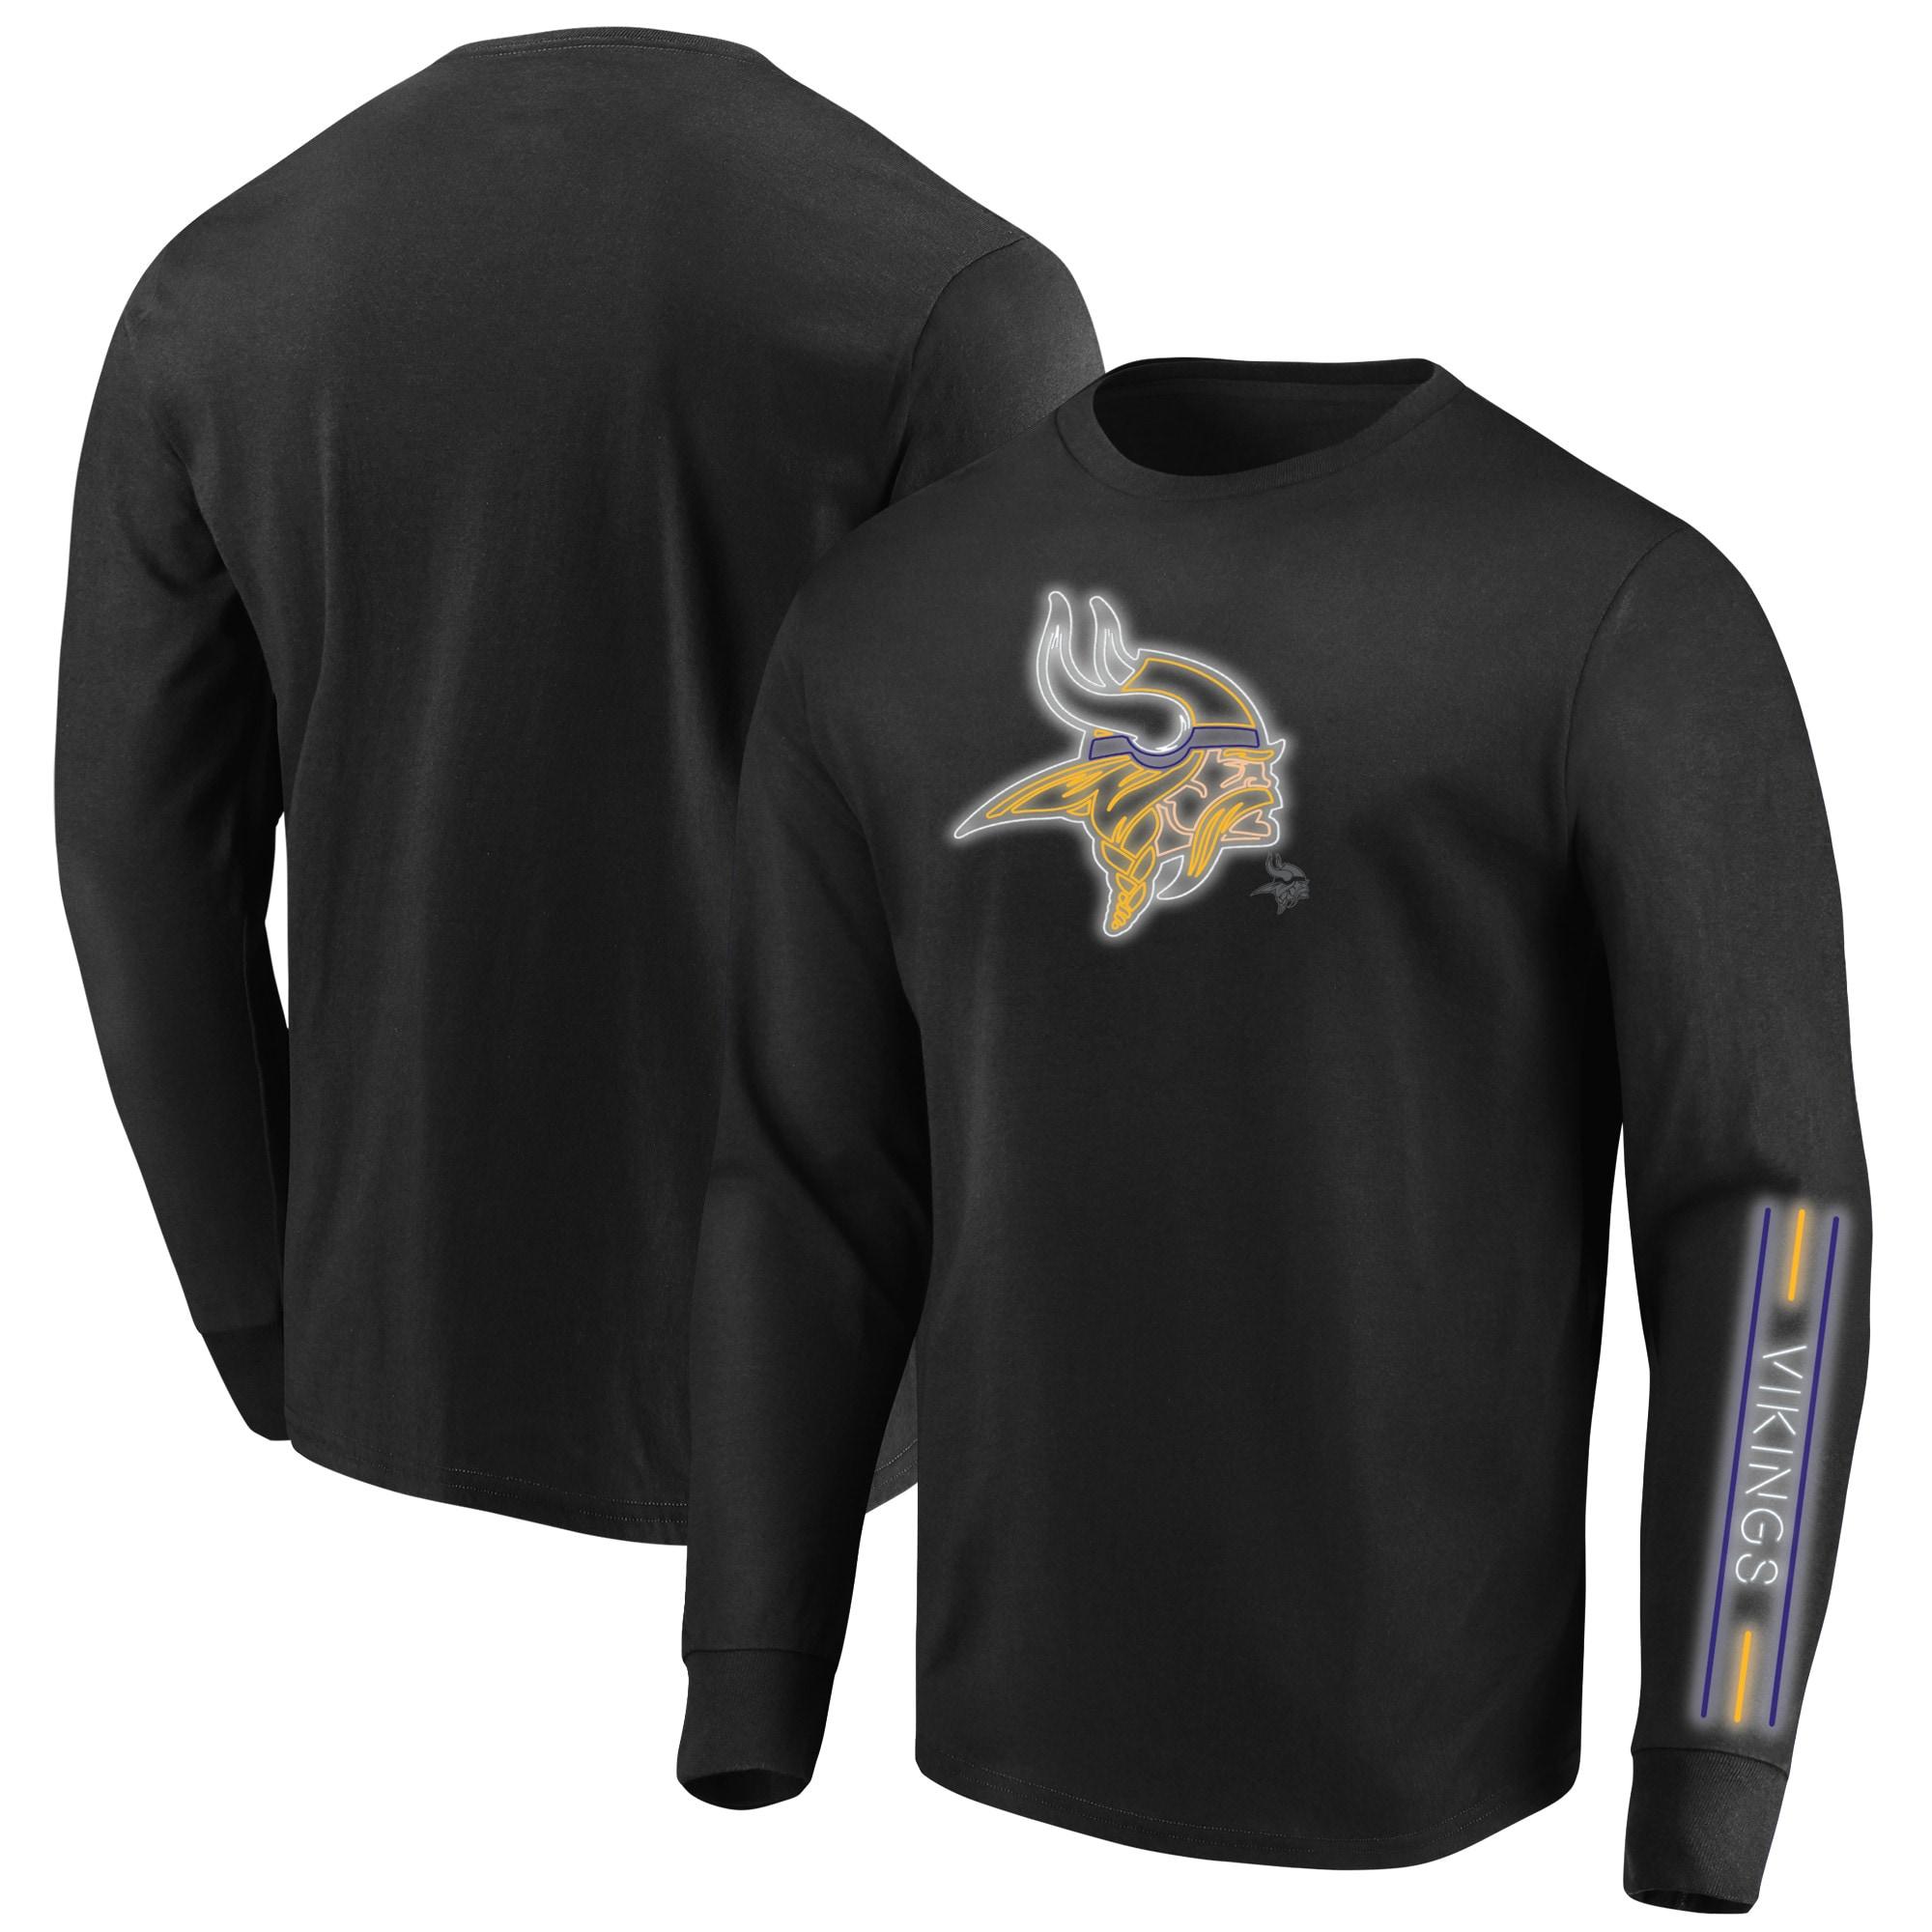 Minnesota Vikings Majestic Big & Tall Startling Success Long Sleeve T-Shirt - Black